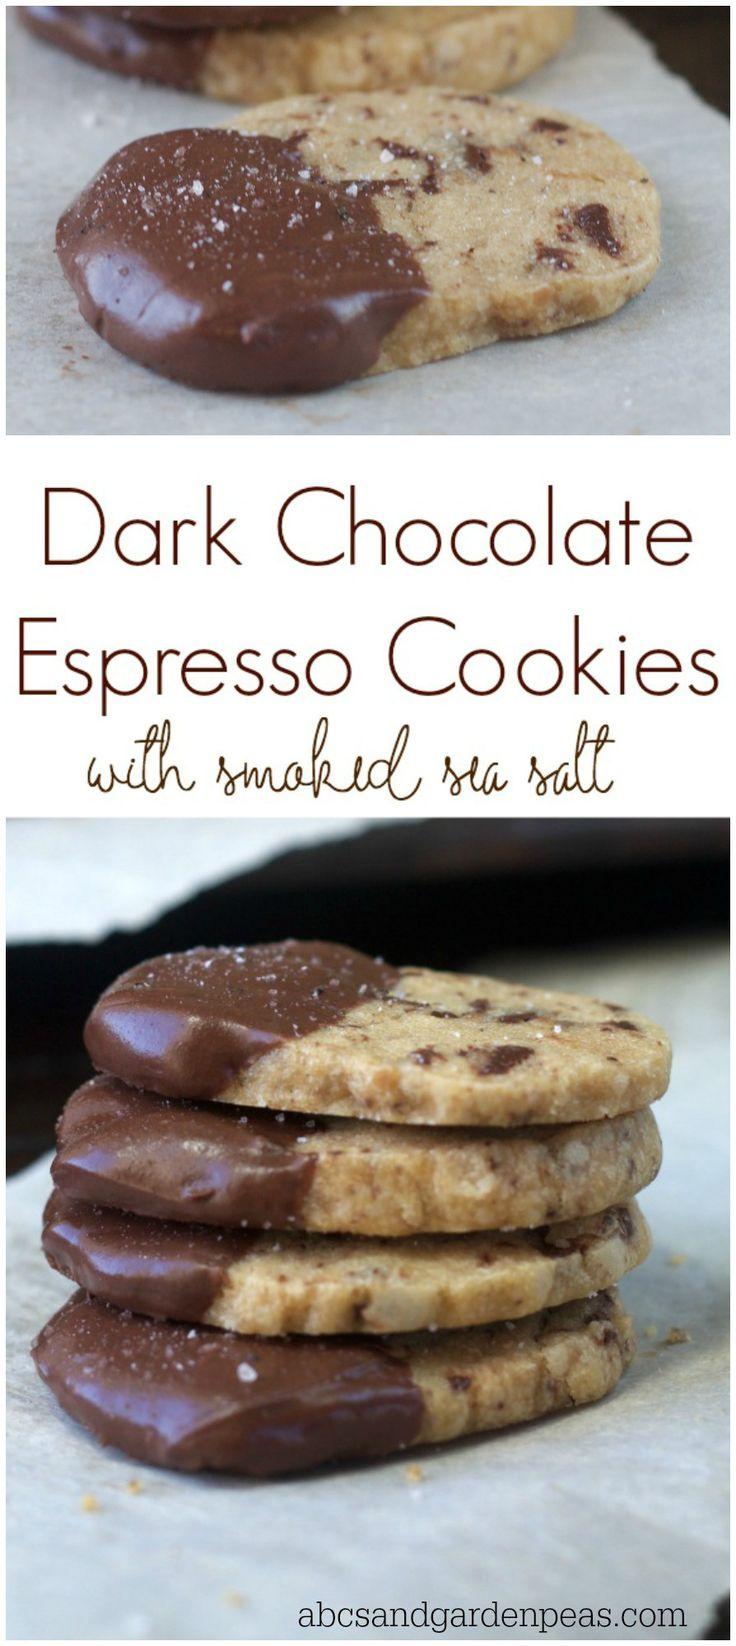 Dark Chocolate Espresso Cookies with Smoked Sea Salt